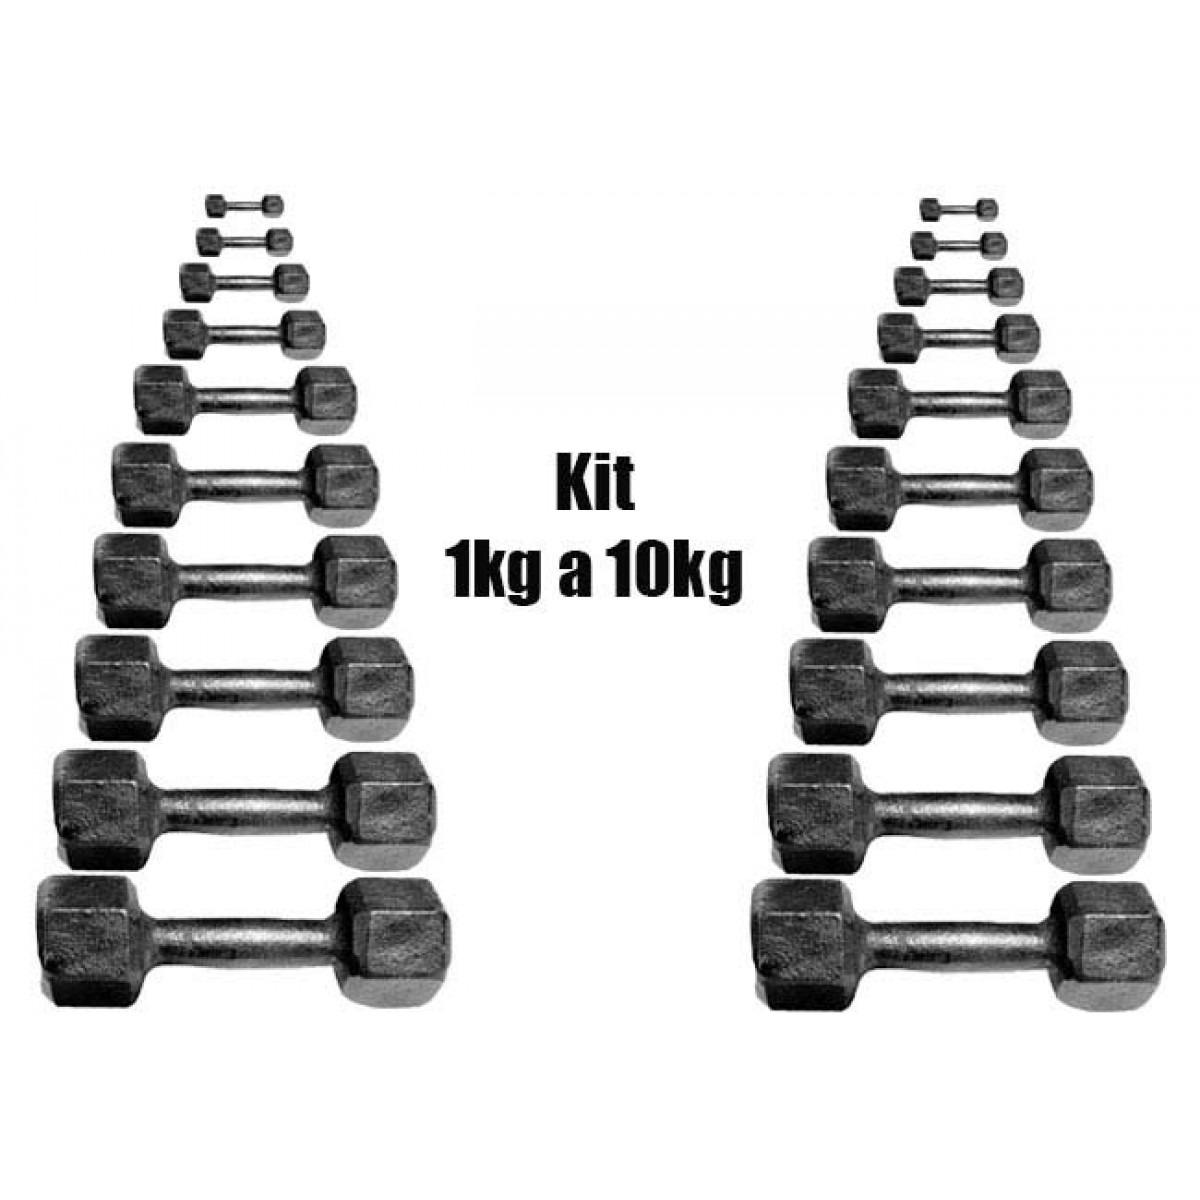 394e09ae6 Kit Halteres Dumbells Sextavado Ferro 1 Kg A 10 Kg (par) - R  759